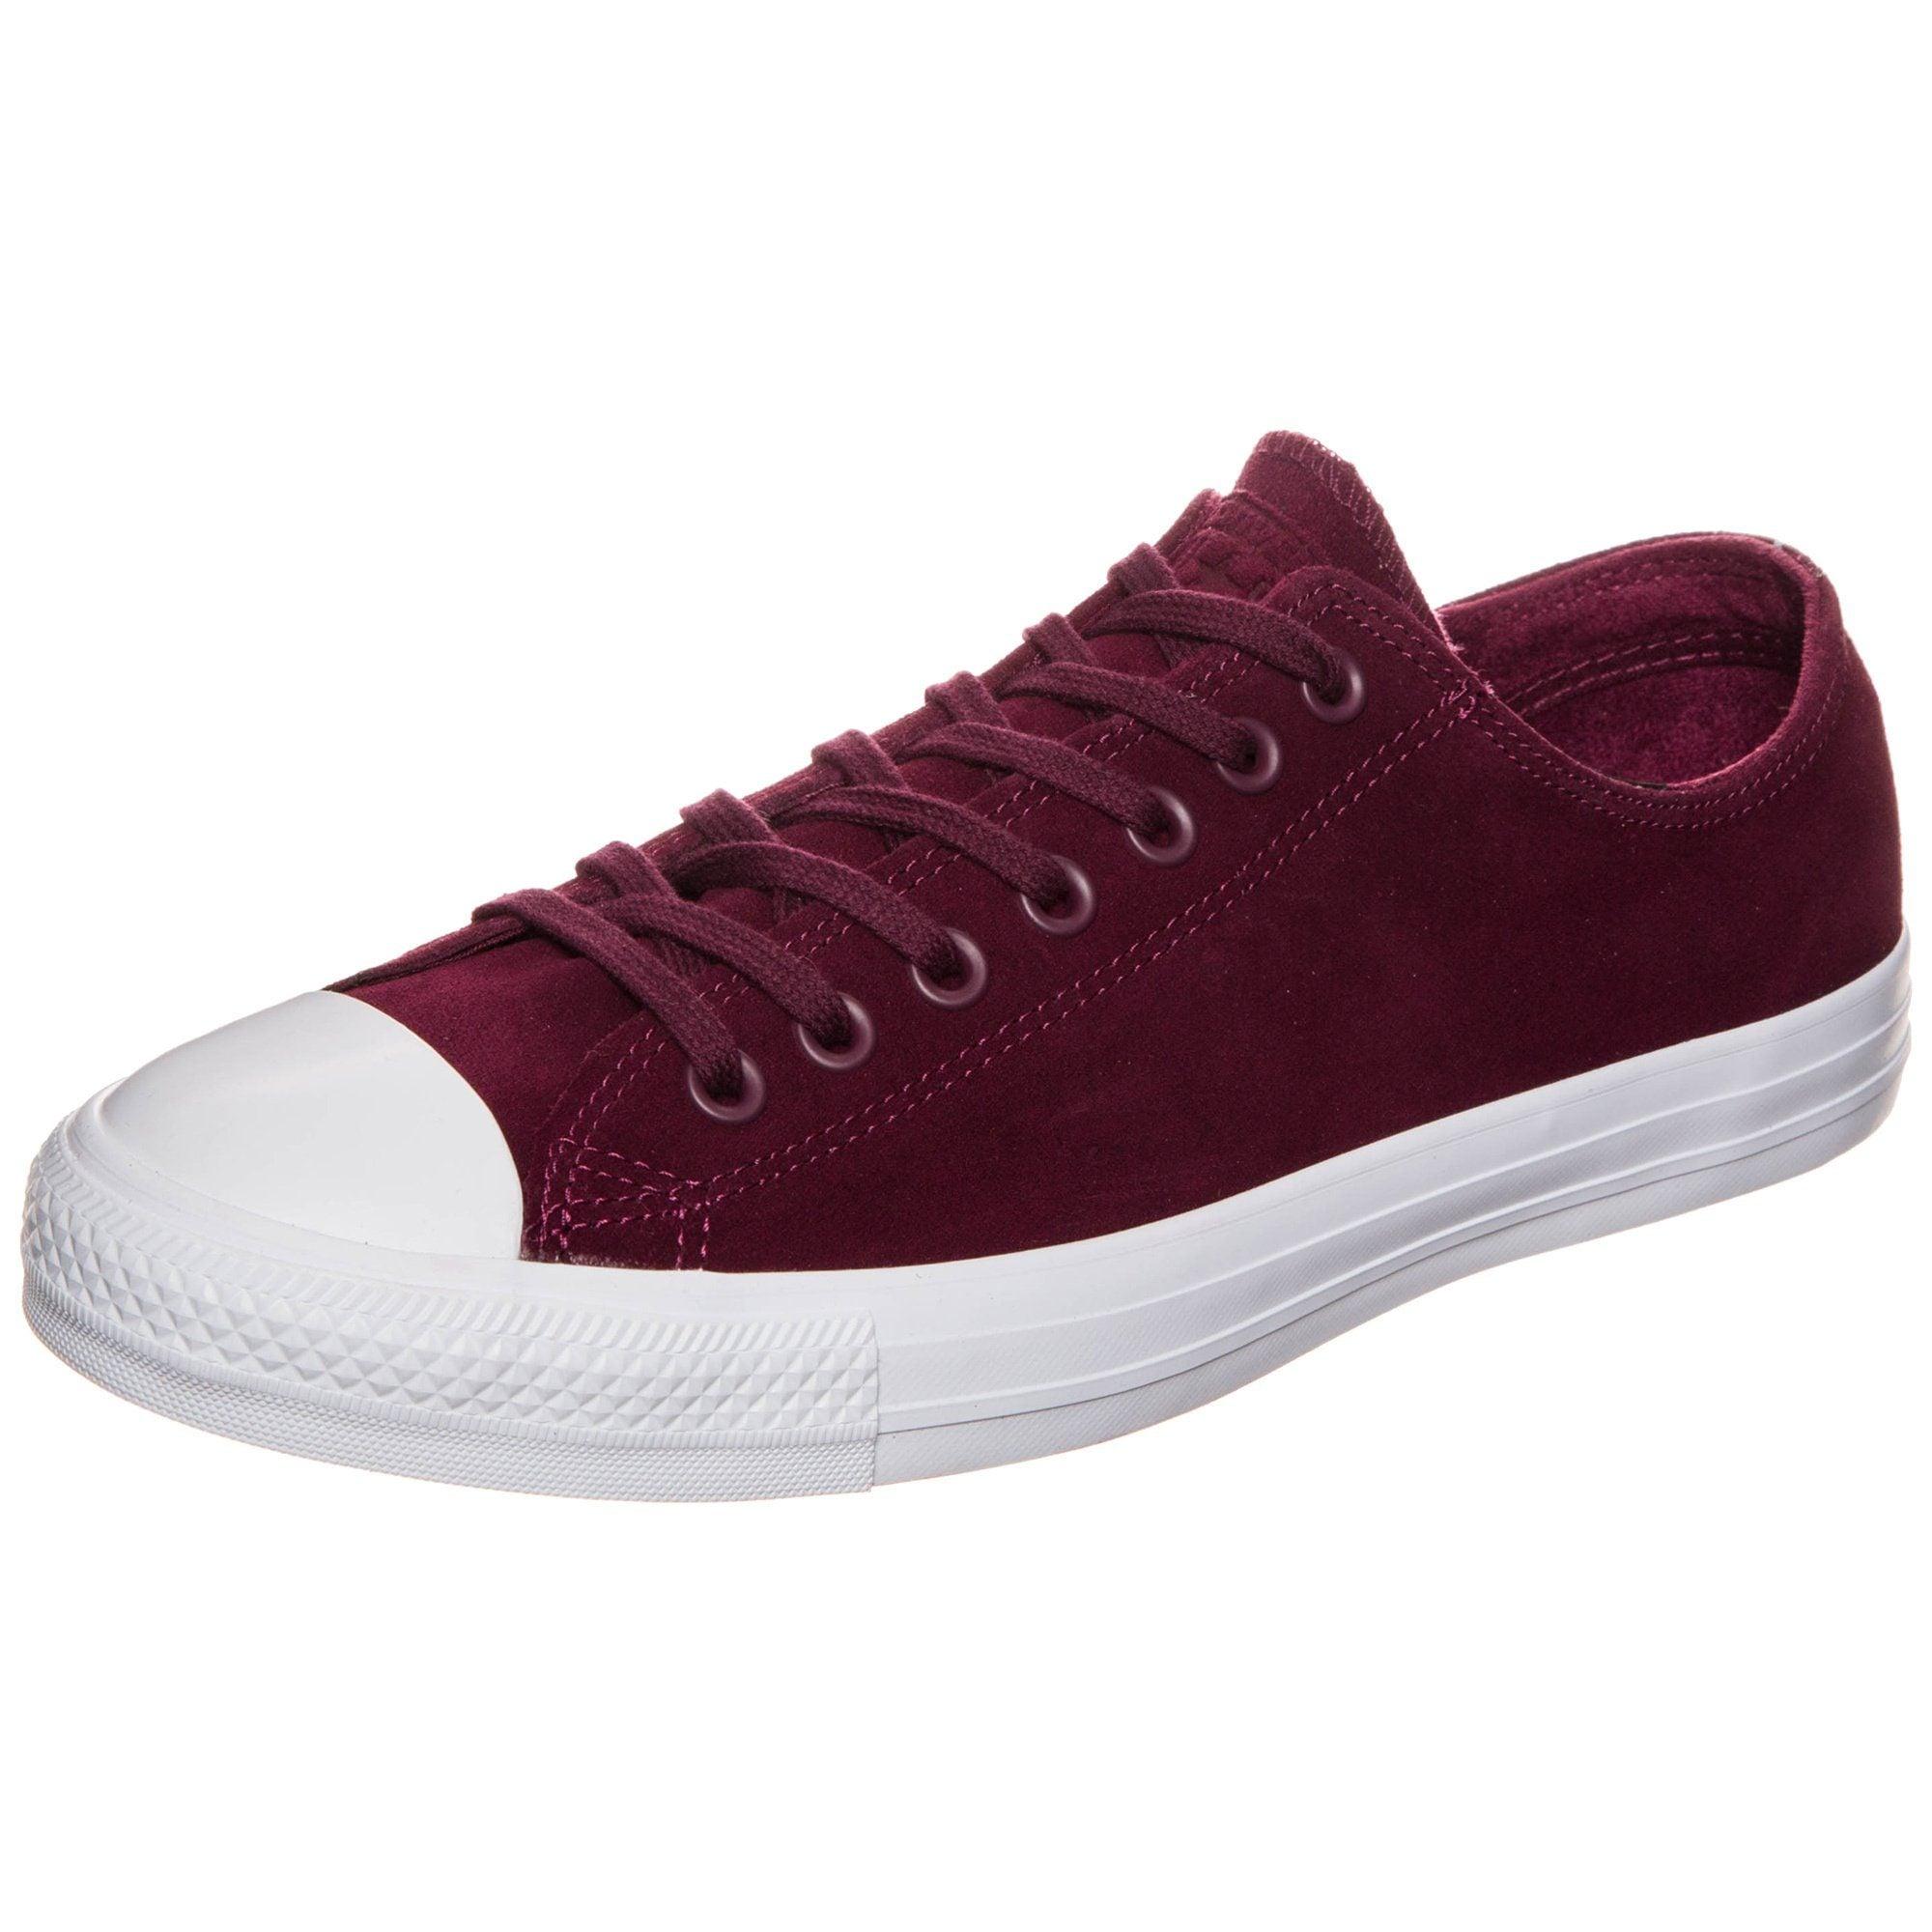 Converse Sneaker Chuck Taylor All Star Plush Suede Ox | Schuhe > Sneaker > Sneaker low | Rot | Converse